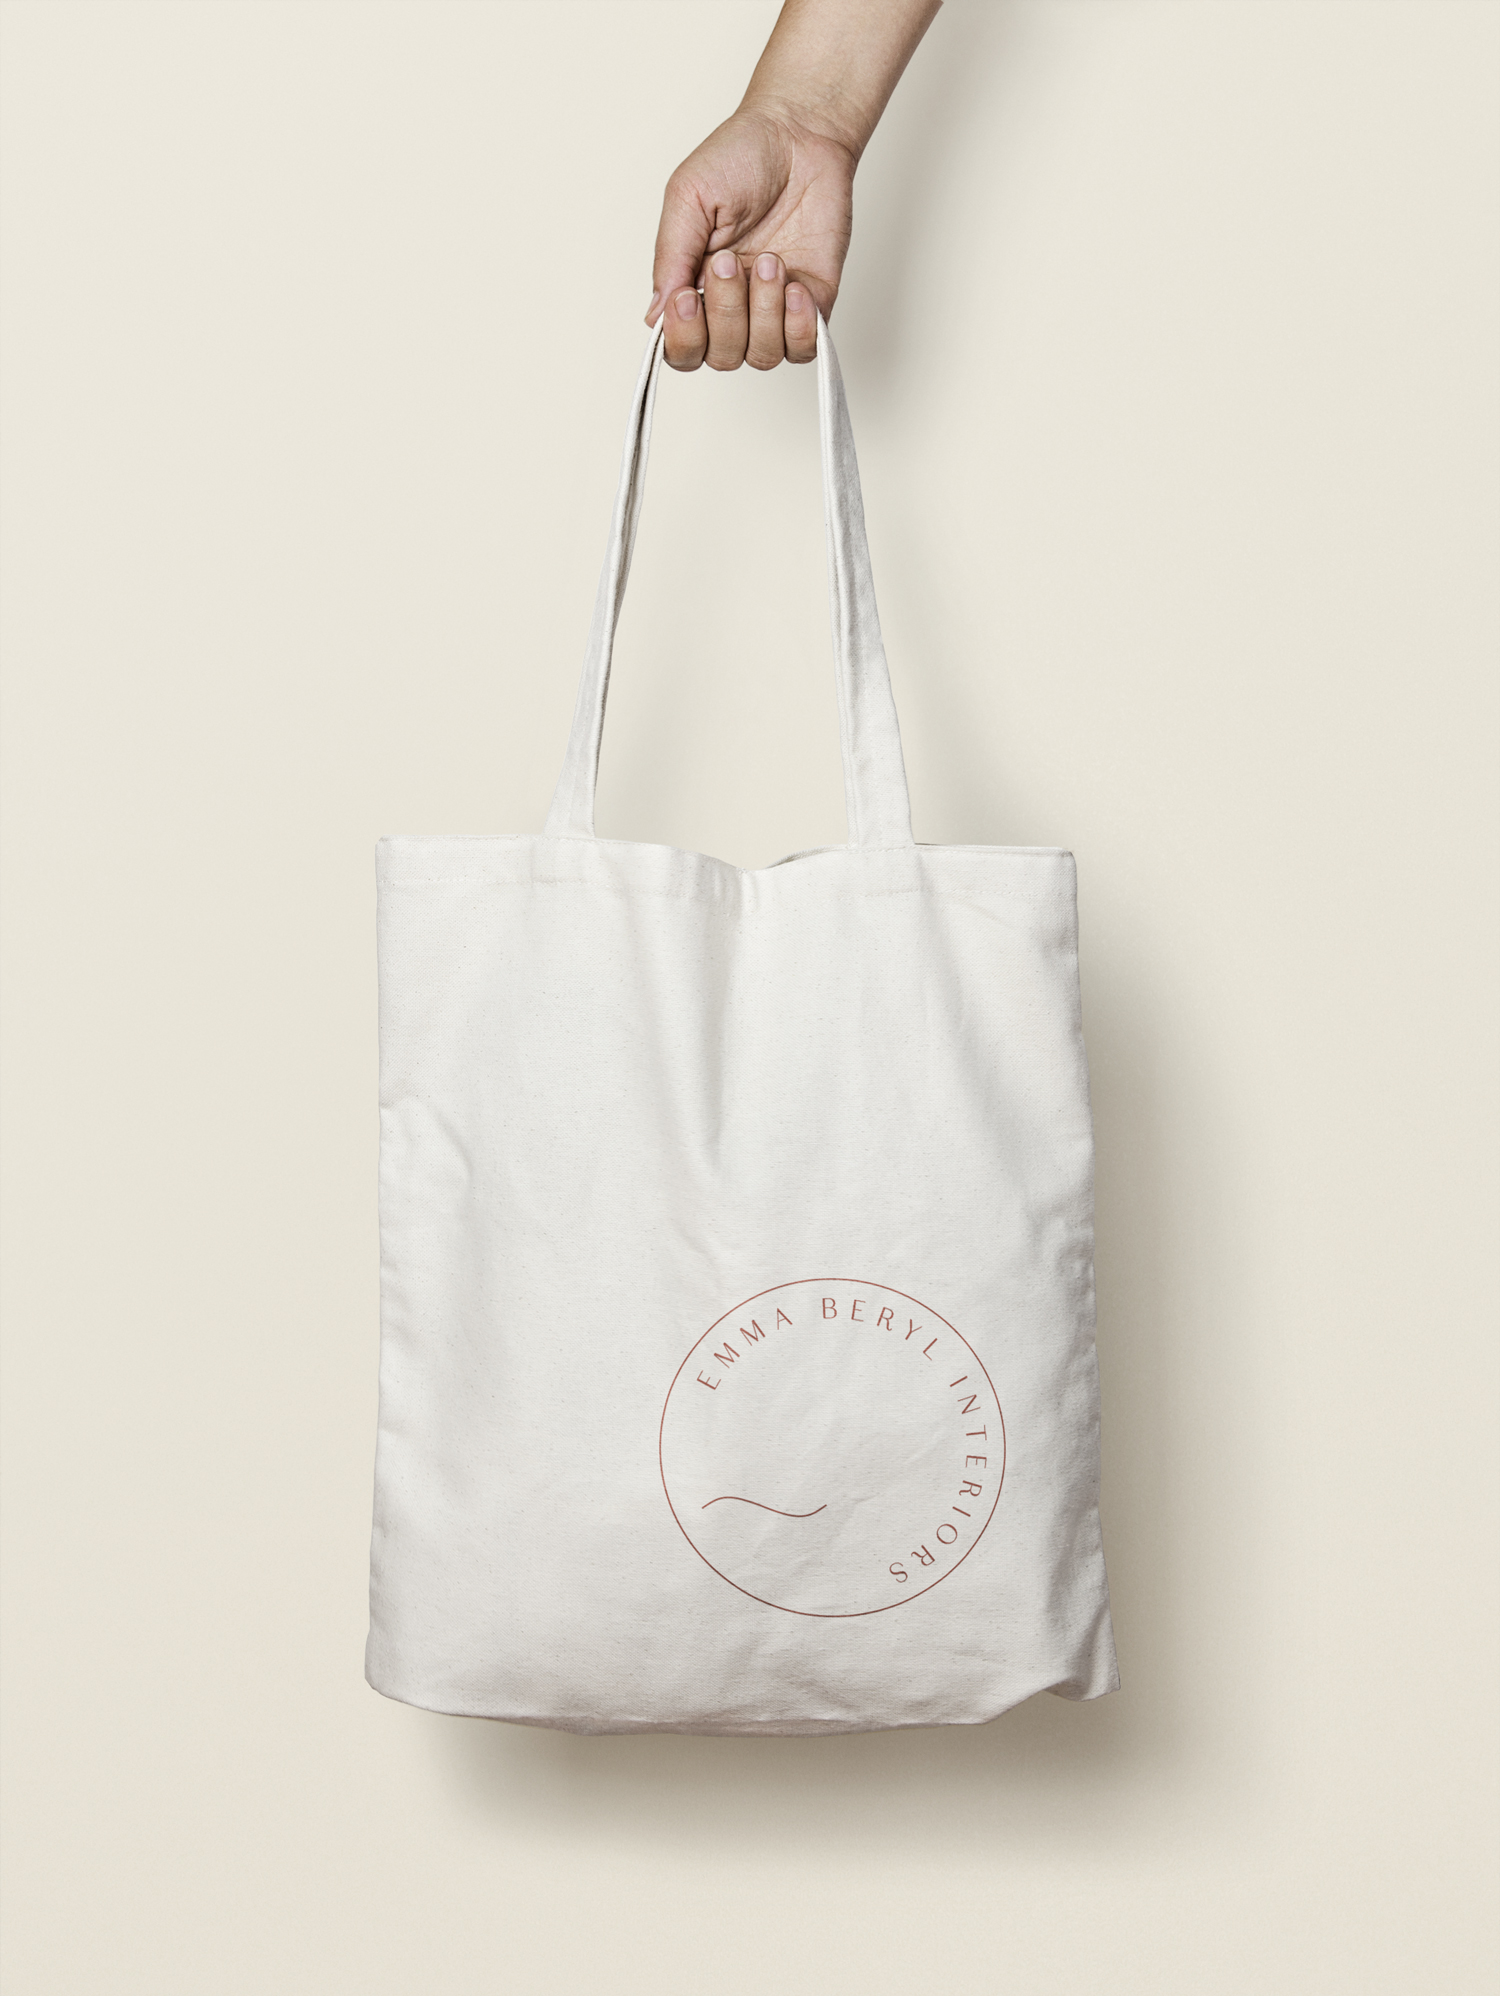 Emma-Beryl-Totebag-Design.jpg